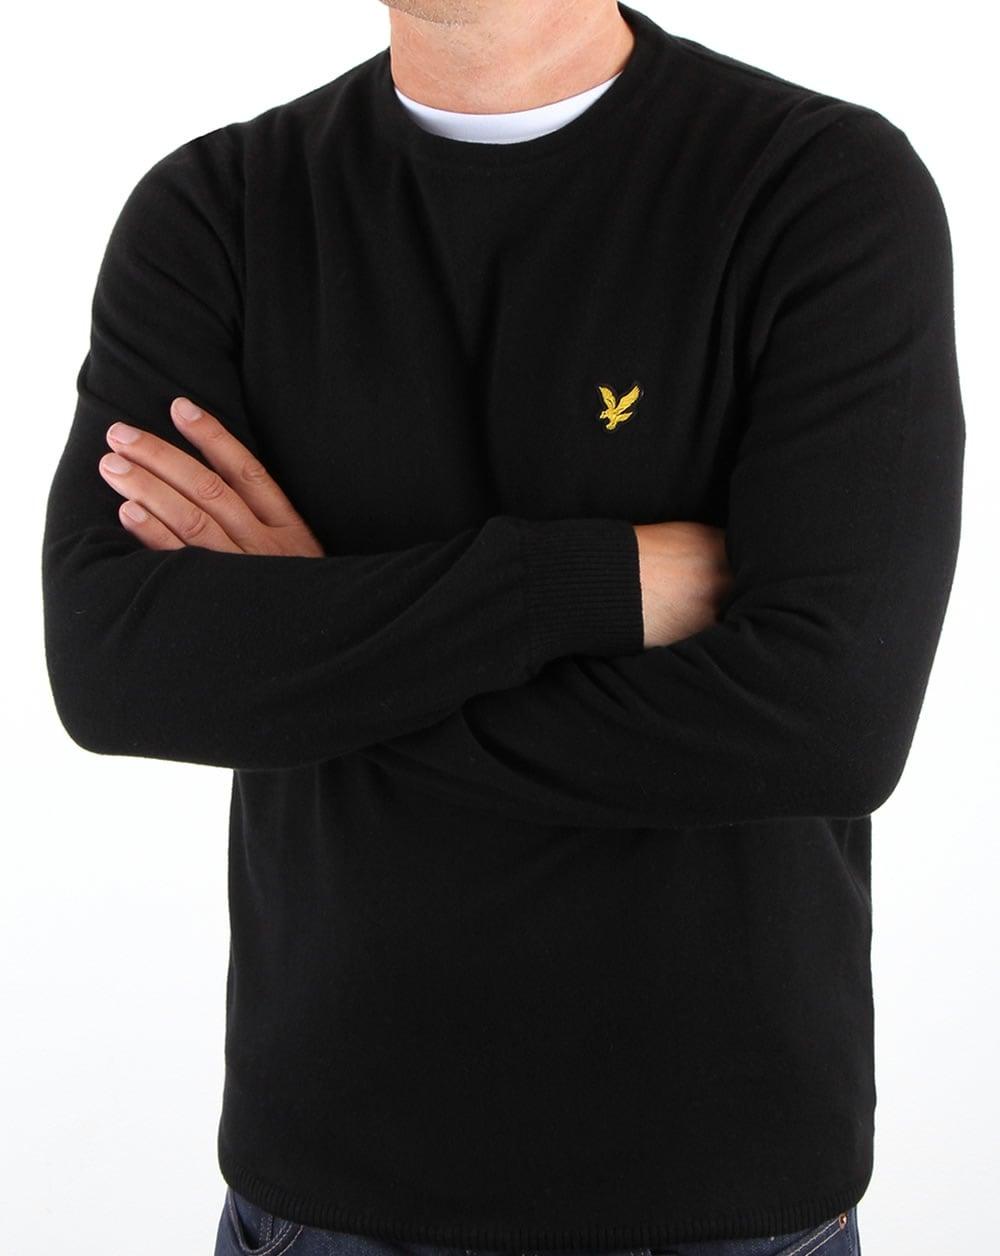 lyle and scott merino jumper true black crew neck cotton knit mens. Black Bedroom Furniture Sets. Home Design Ideas